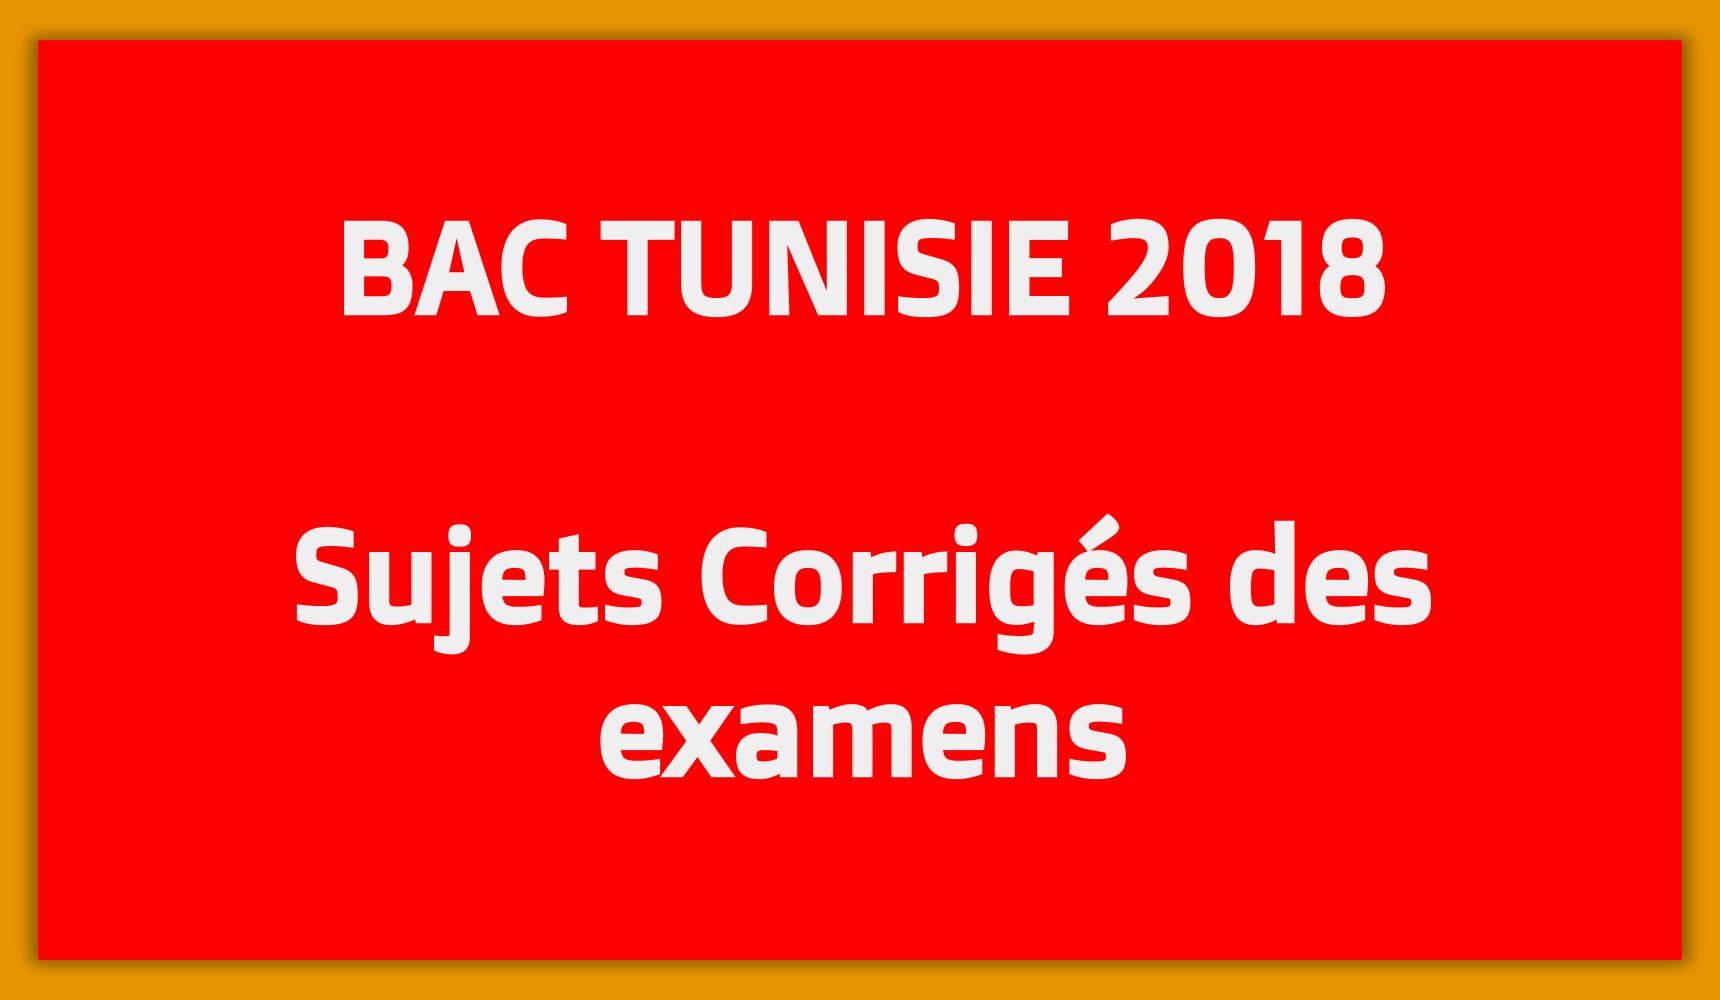 Bac Tunisie 2018 Sujets Corriges Des Exercices Du Bac Tunisie 2018